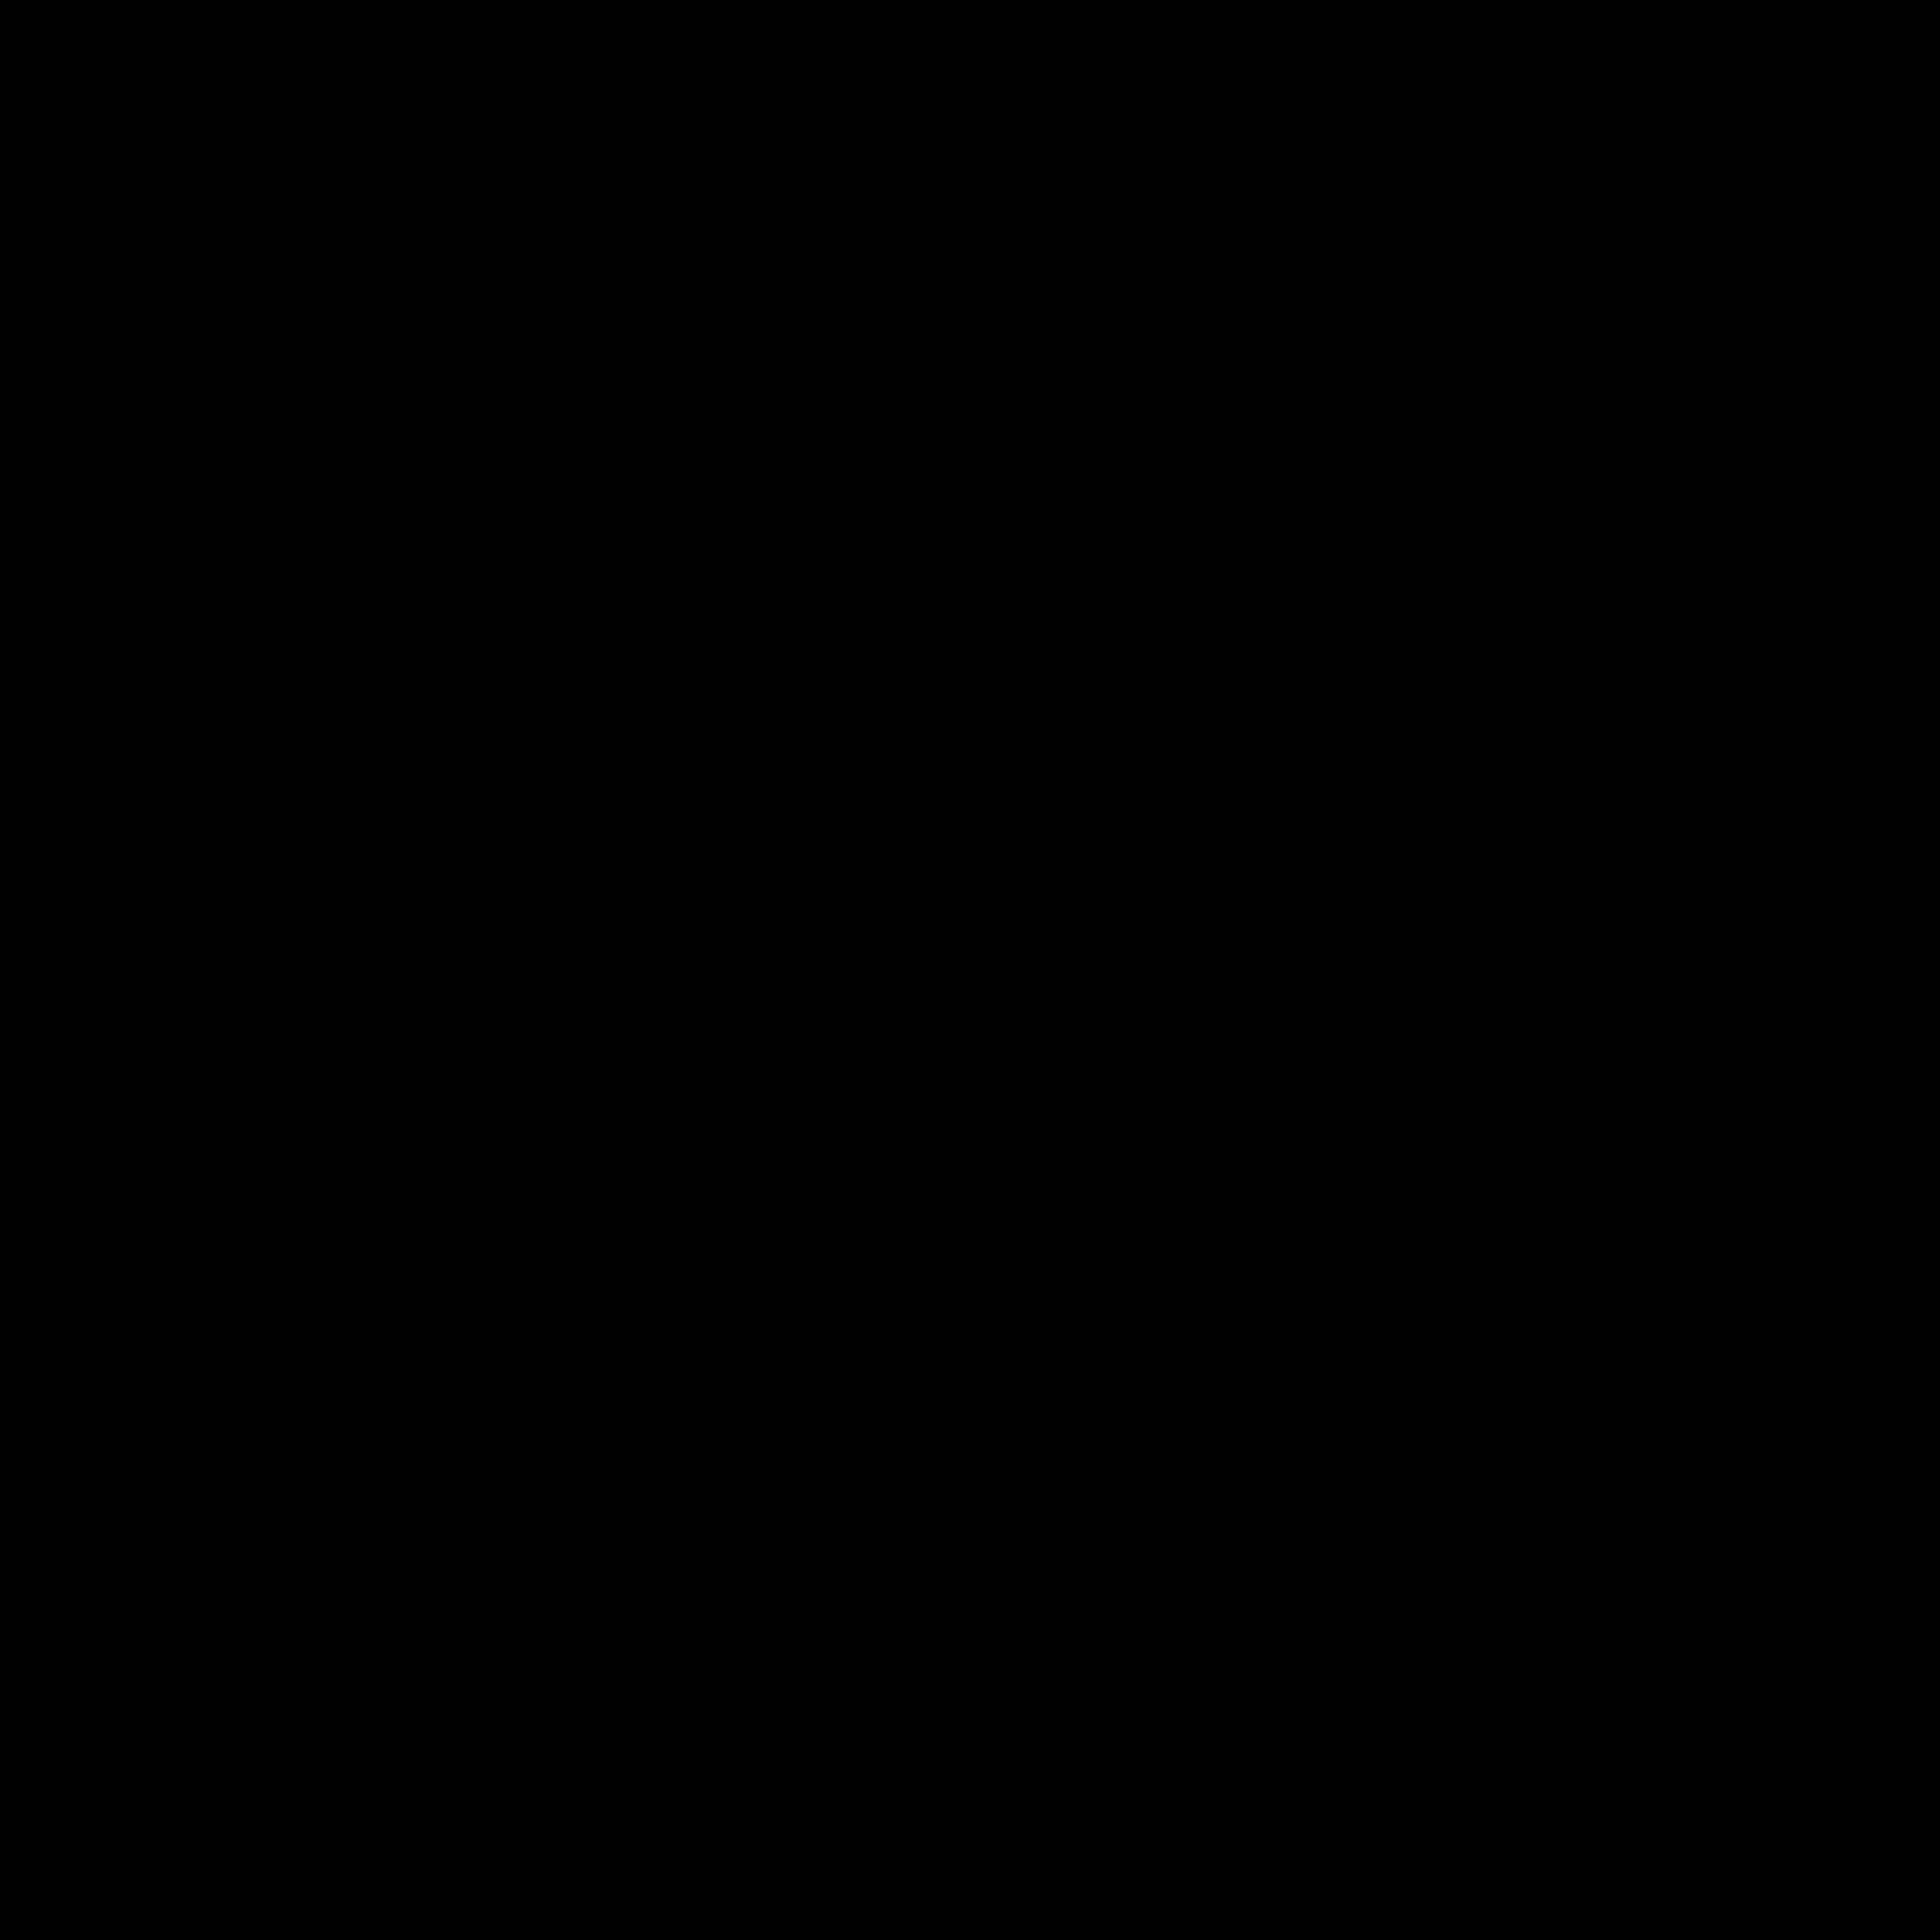 pingup icon